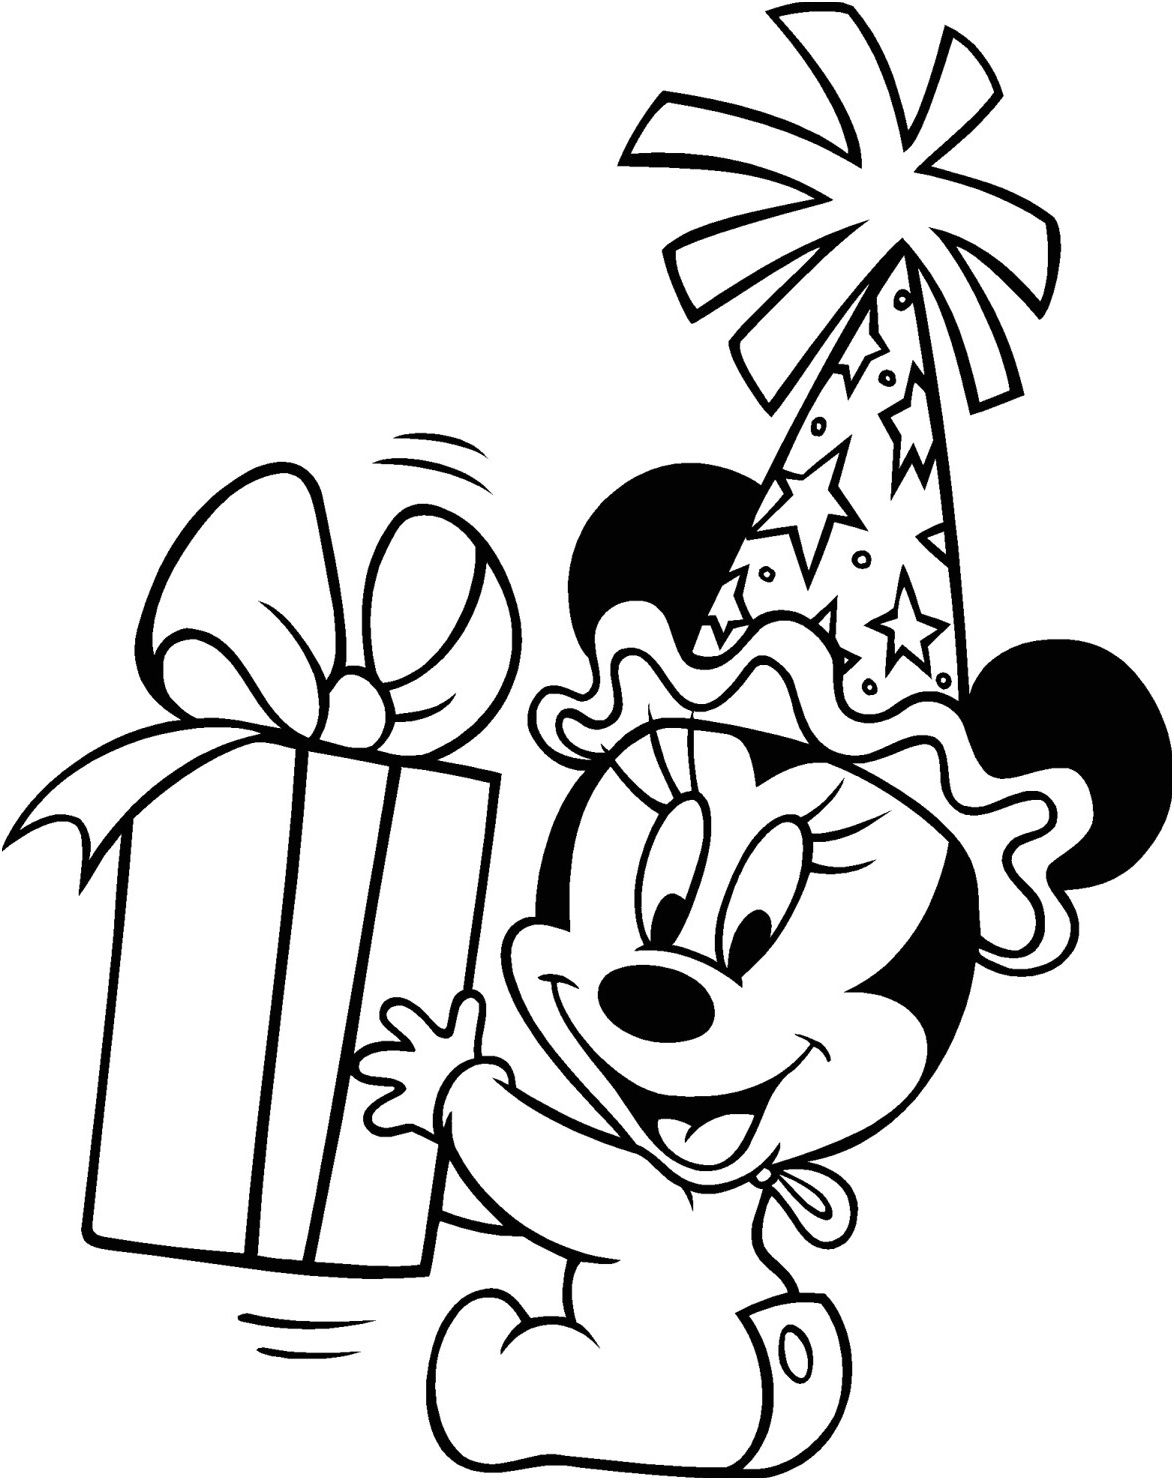 Coloriage Mickey Et Minnie A Imprimer Coloriageminnie En 2020